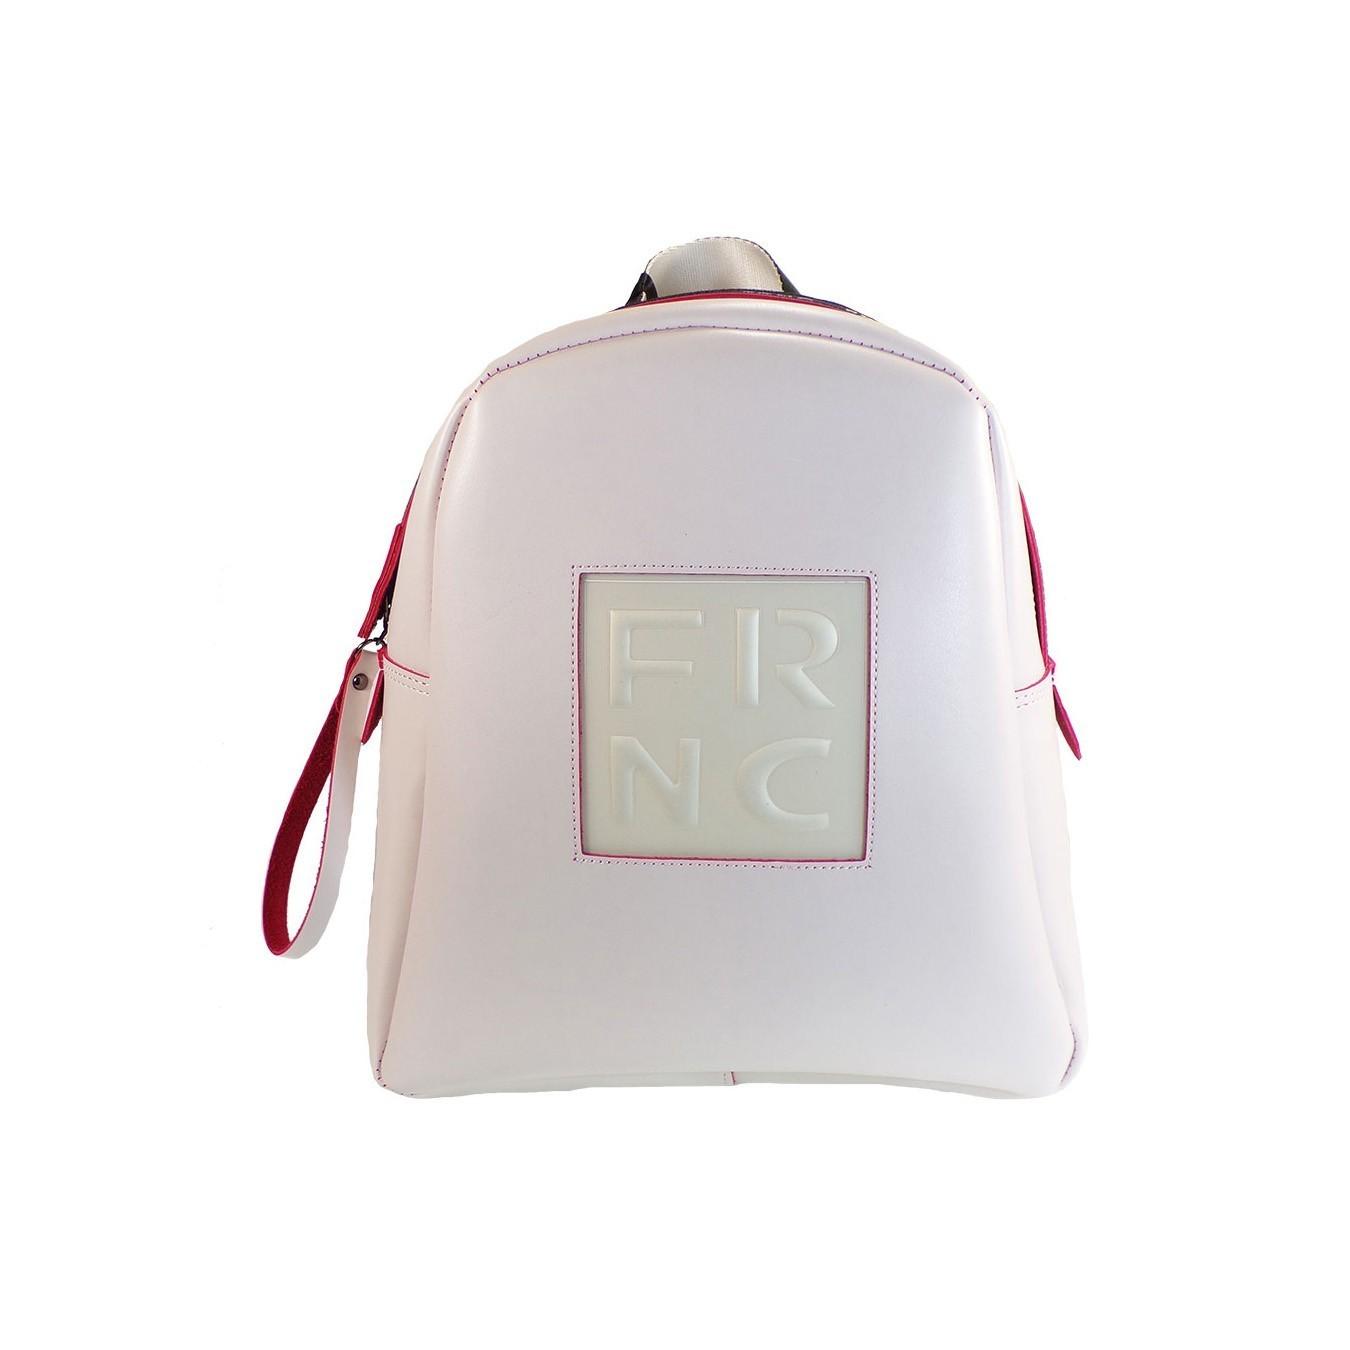 e166d13aa8 FRNC FRANCESCO Τσάντα Γυναικεία Πλάτης-Backpack 1201 Οff White Δέρμα ...